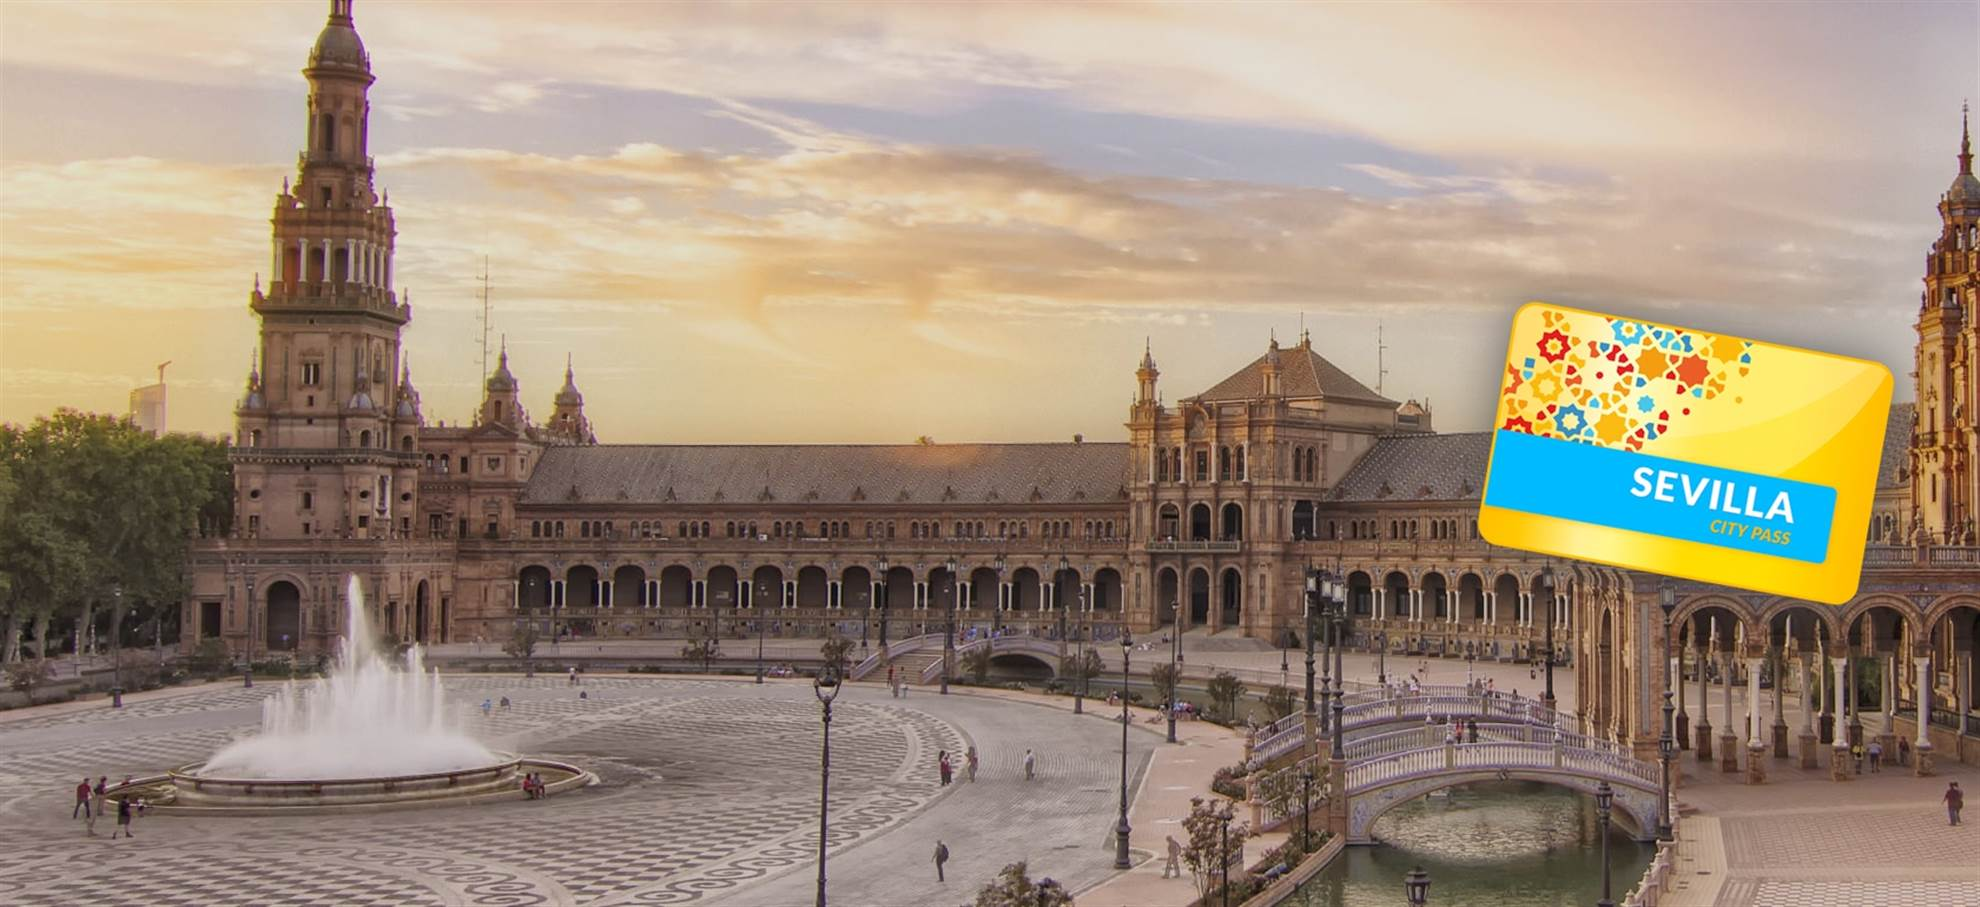 Passe de Sevilha (Alcazar, Catedral)